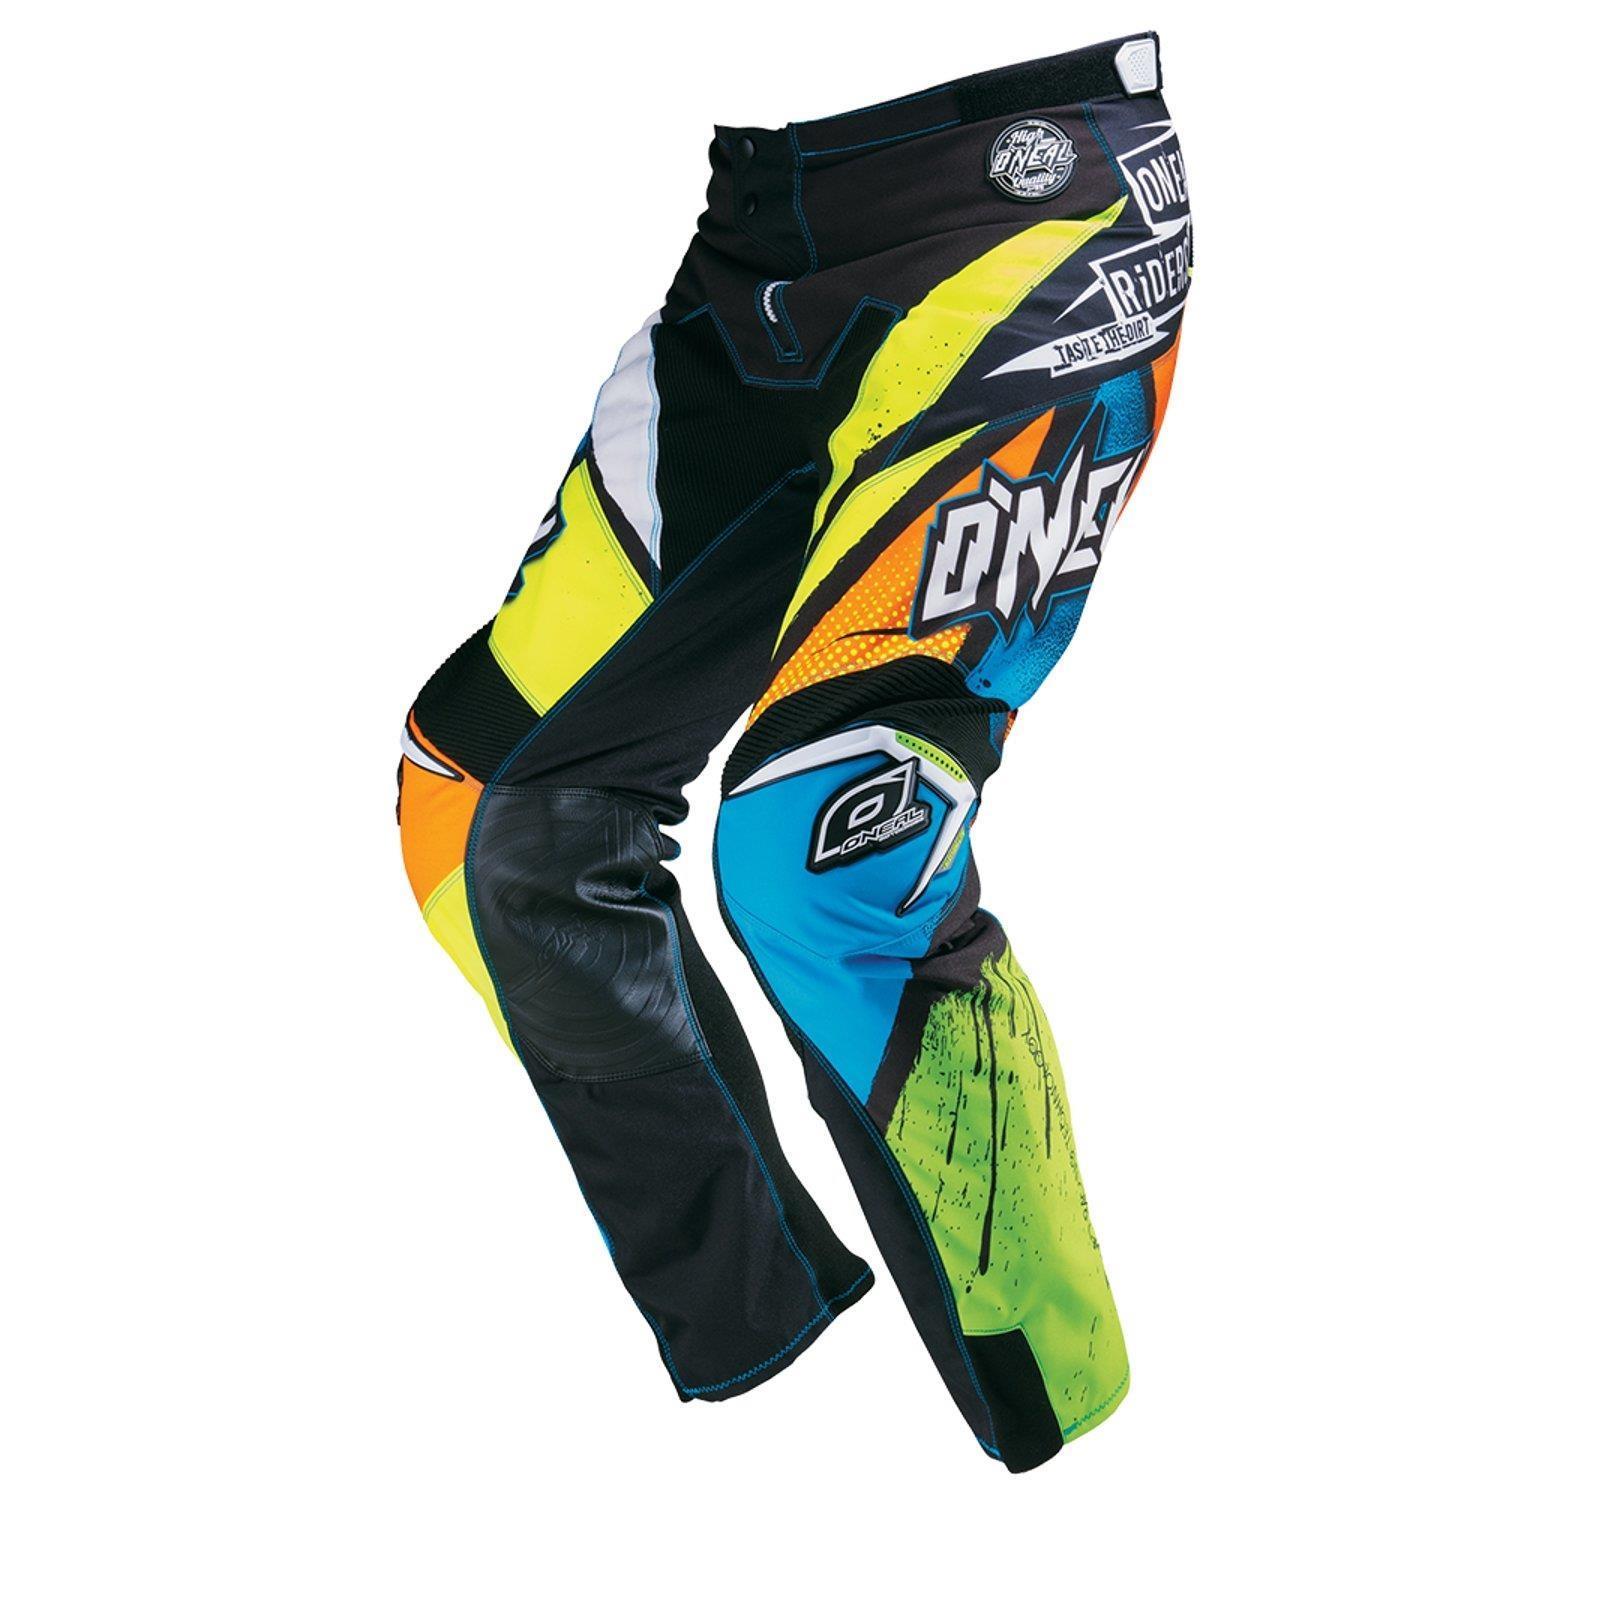 O-039-neal-elemento-Mayhem-Hardwear-Pants-pantalones-MX-Moto-Cross-Enduro-todoterreno-cuero miniatura 21